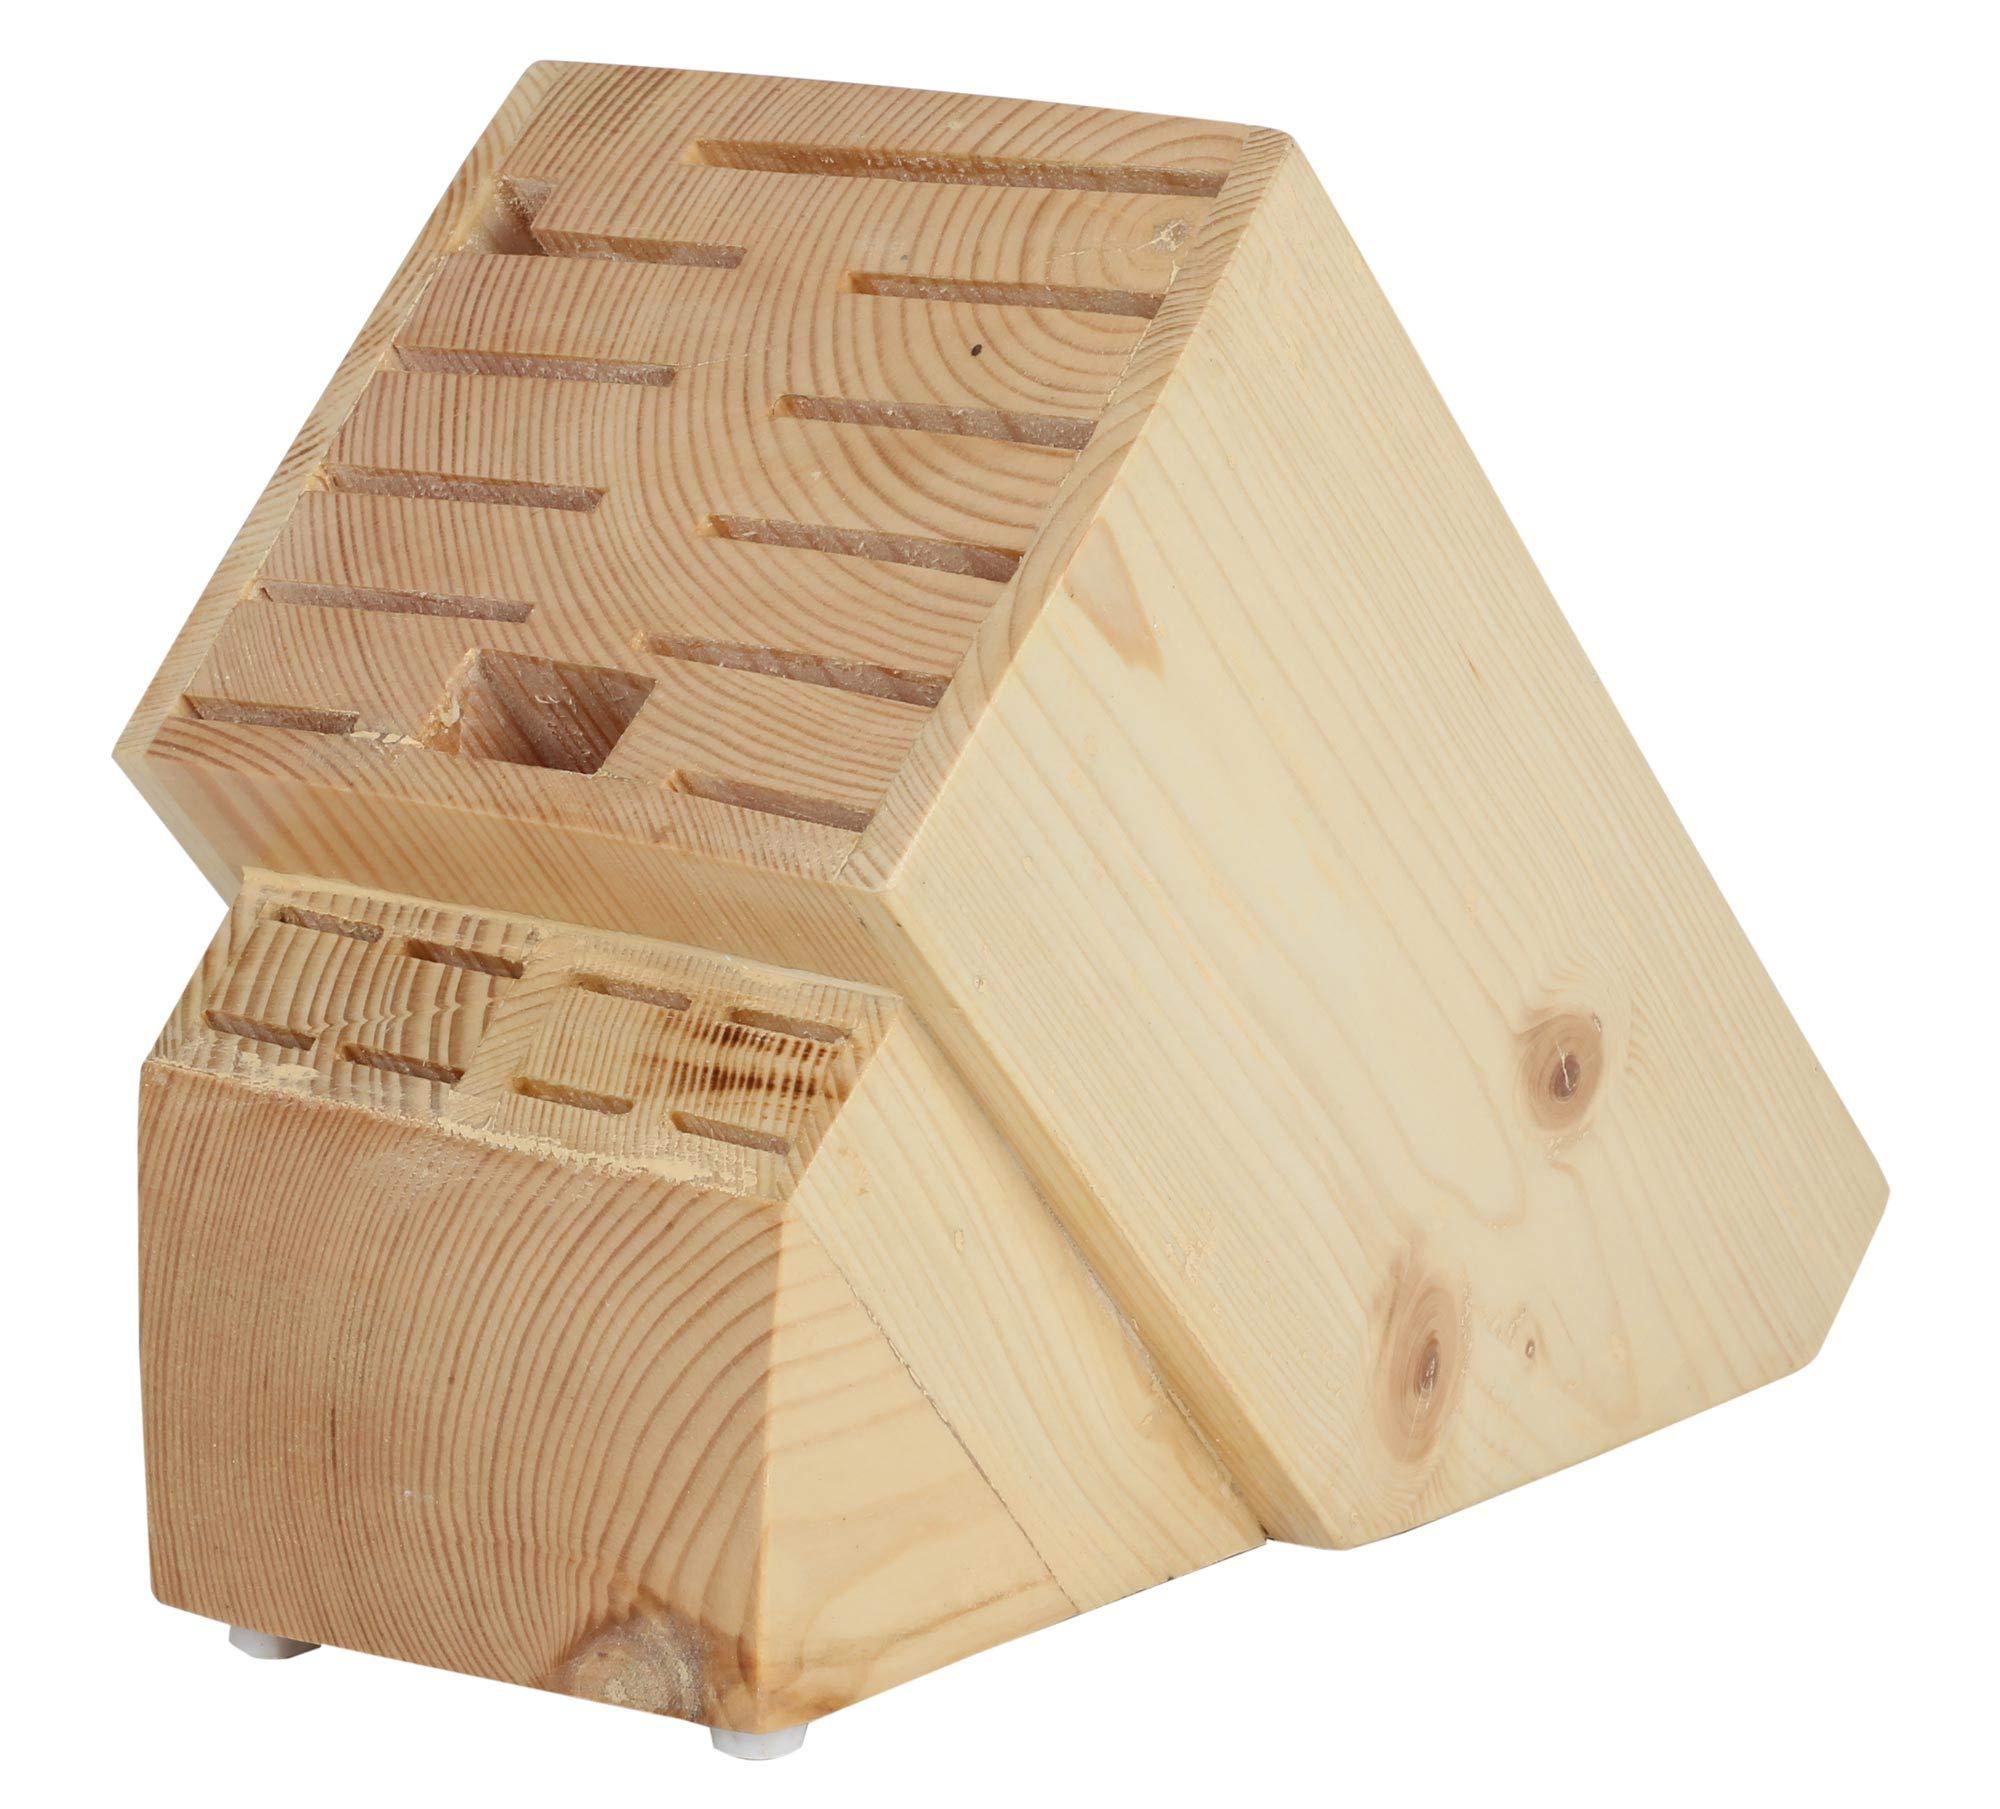 20 Slot Knife Holder Rack - Kitchen Knife Storage Wood Stand Organizer - Universal Knife Block Without Knives